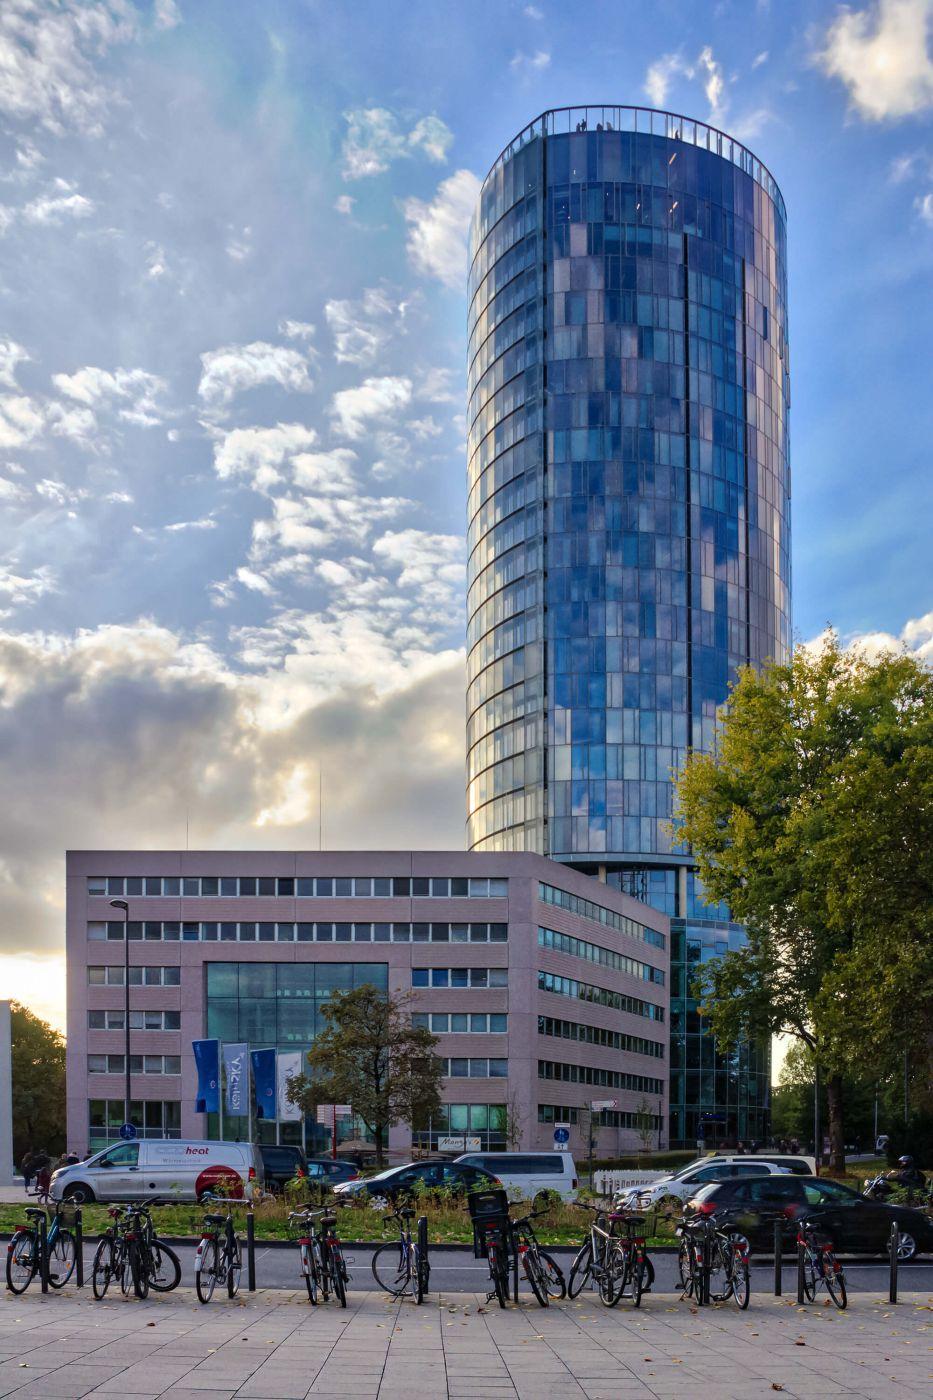 Triangle Tower from Ottoplatz, Germany